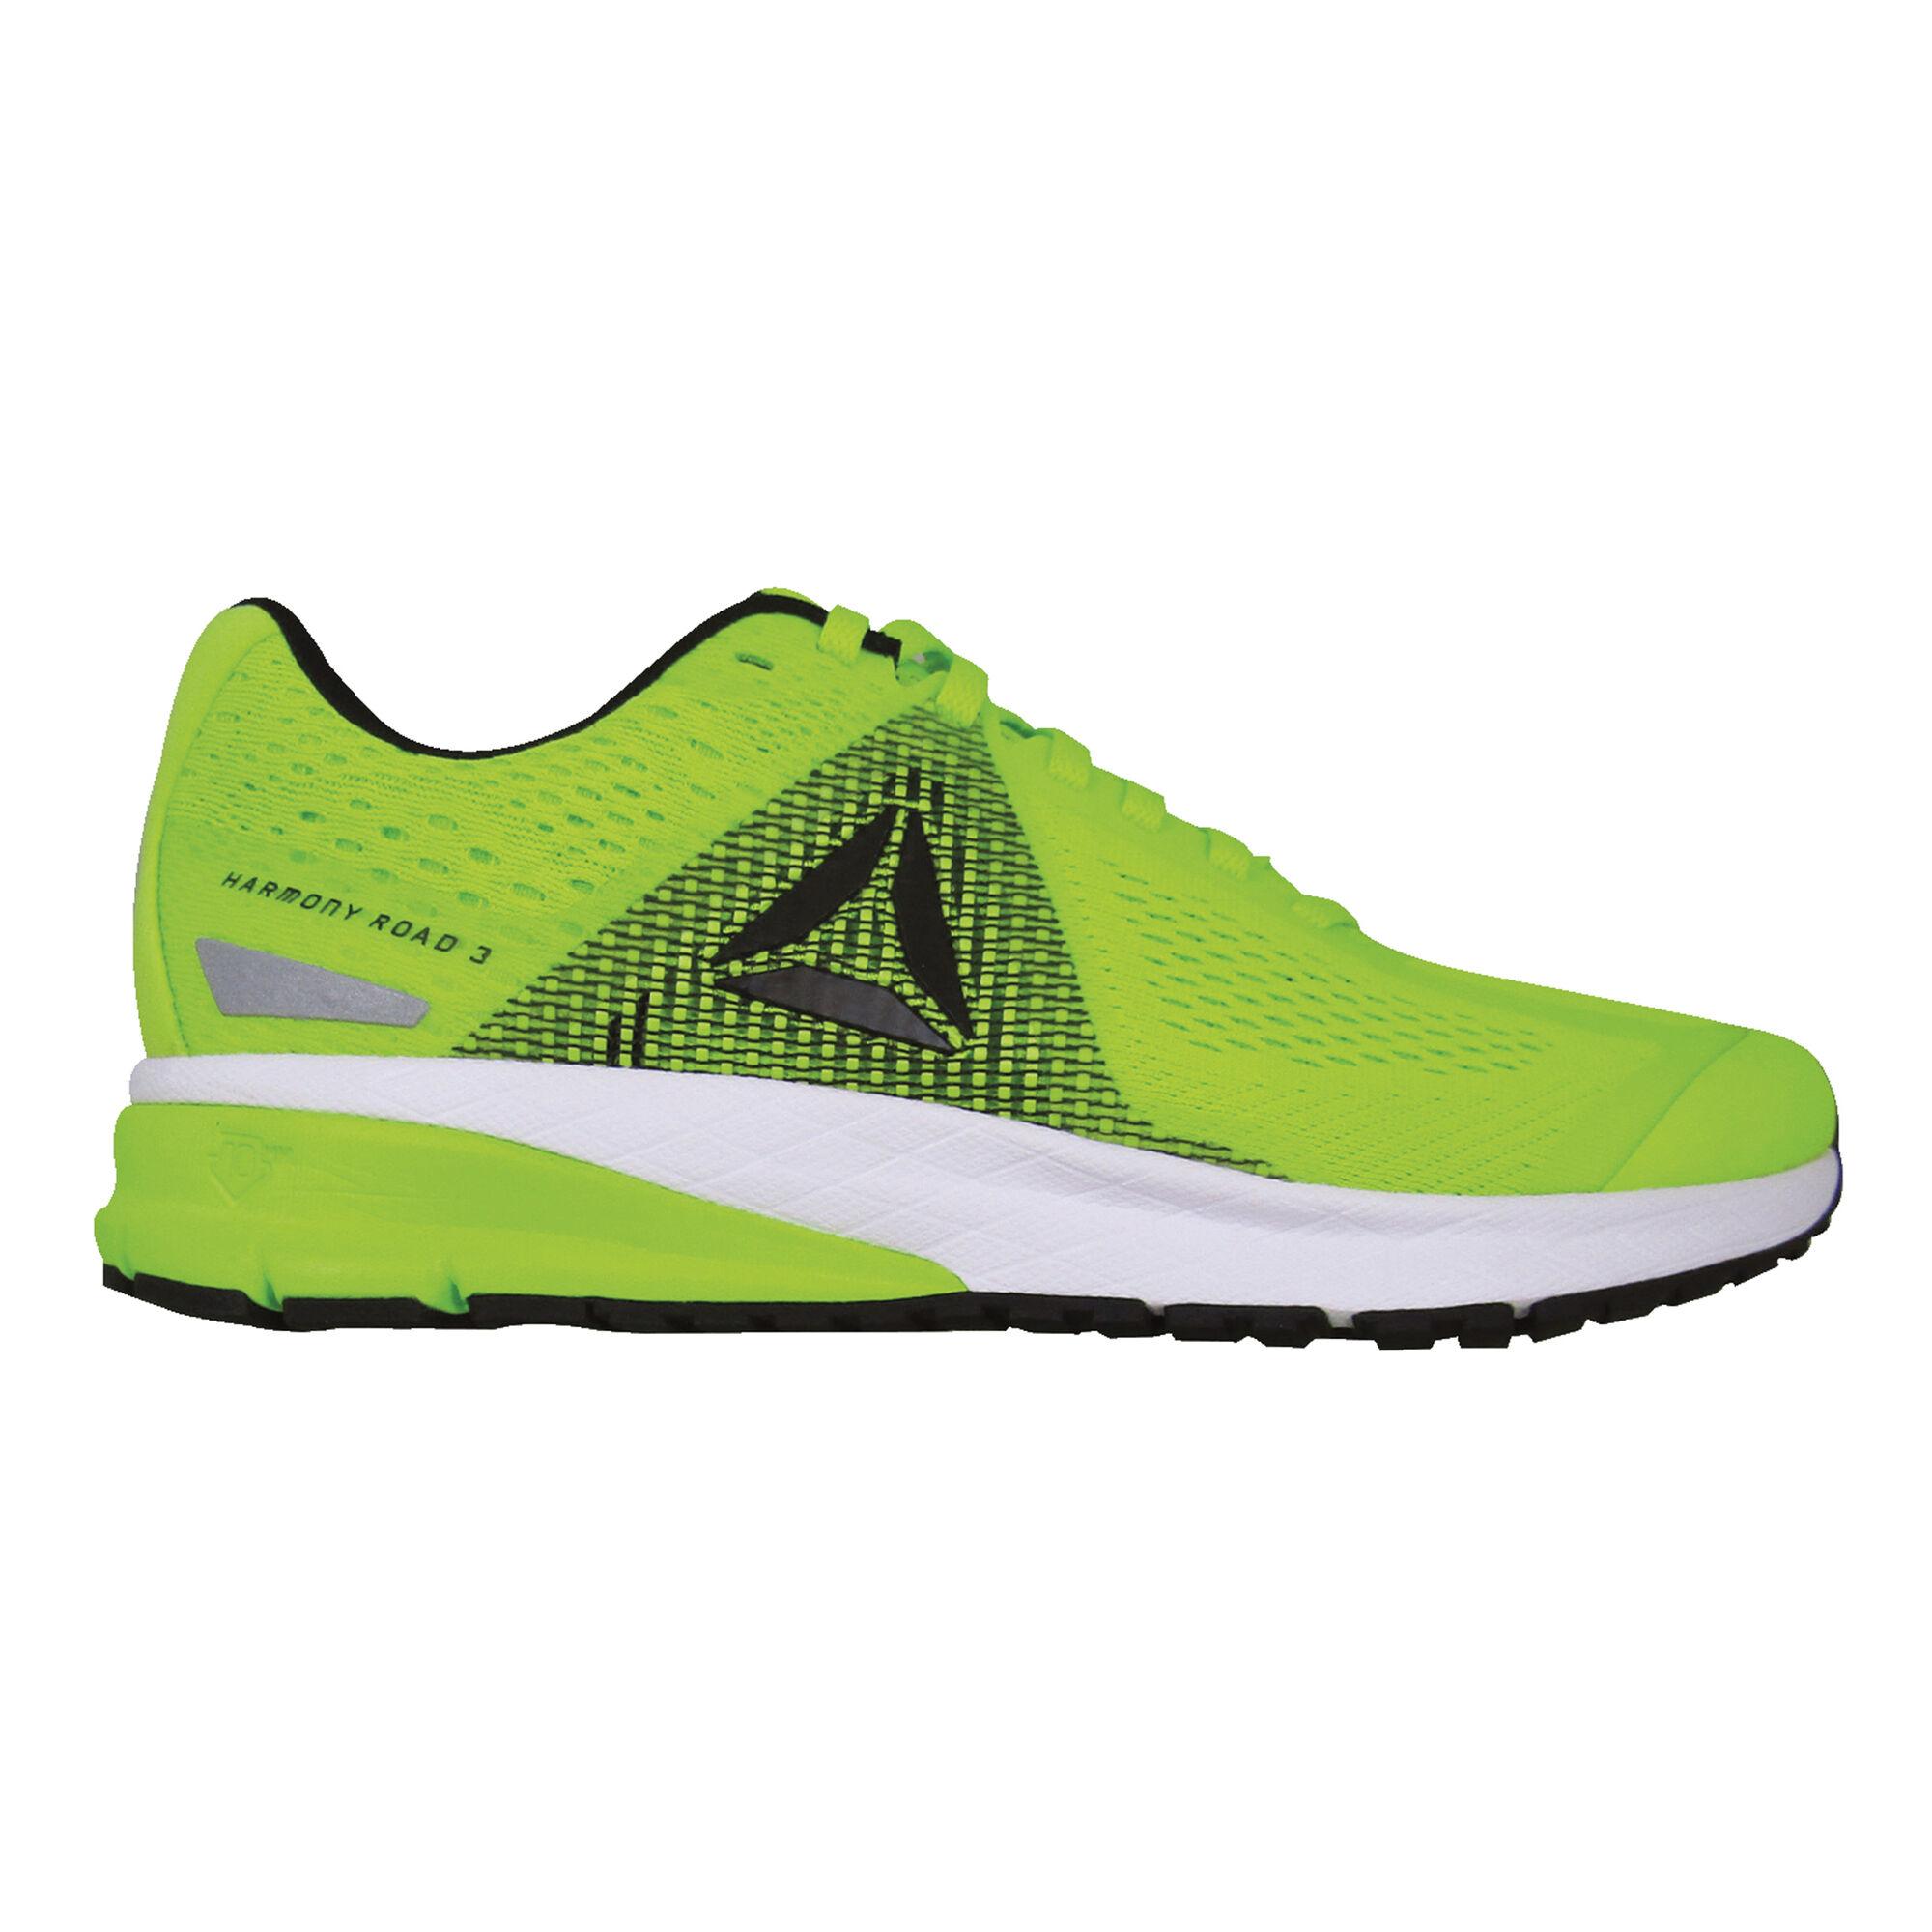 4b7f7d6217 buy Reebok Harmony Road Stability Running Shoe Men - Lime, Black ...